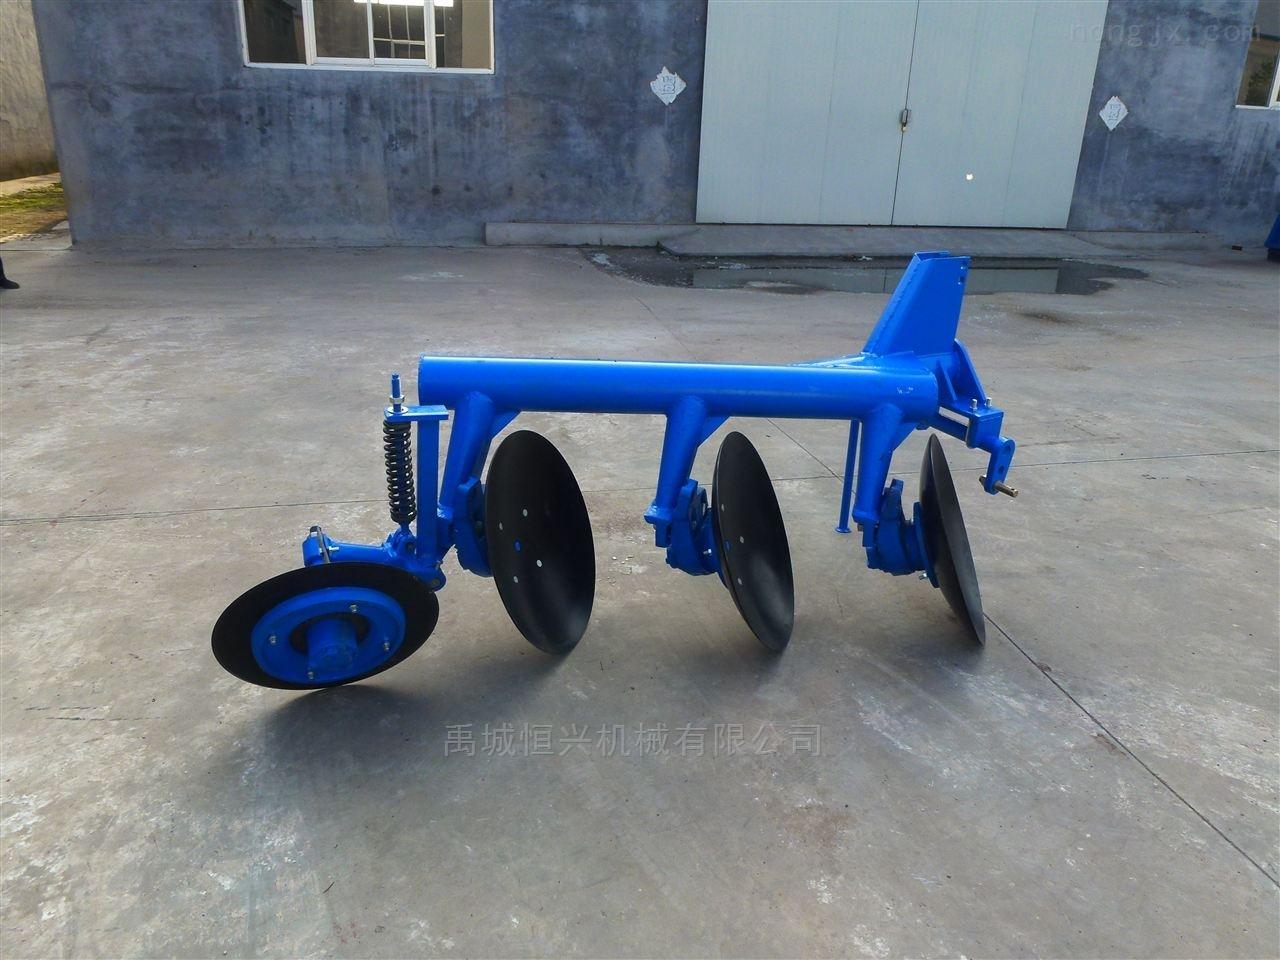 1L系列圆盘犁  农业机械